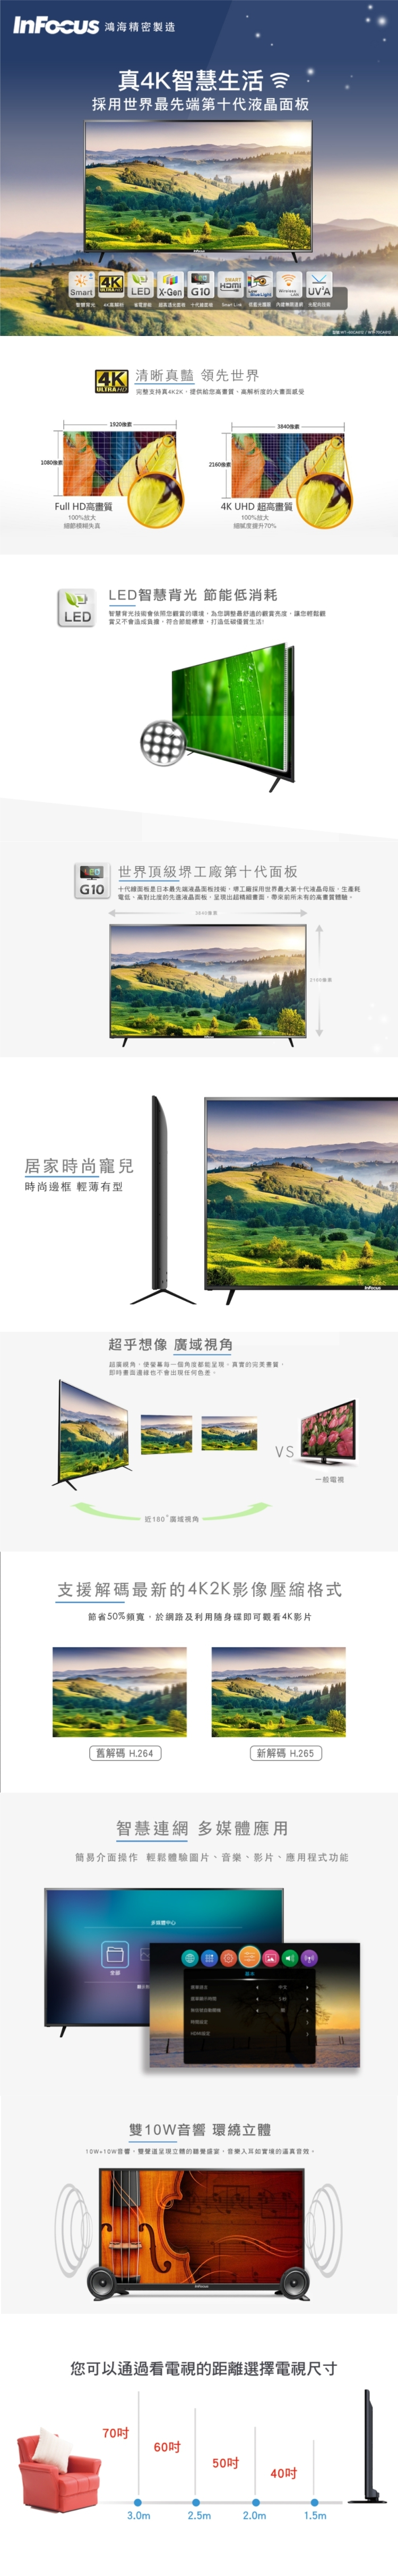 InFocus 60吋4K智慧連網液晶顯示器 WT-60CA612